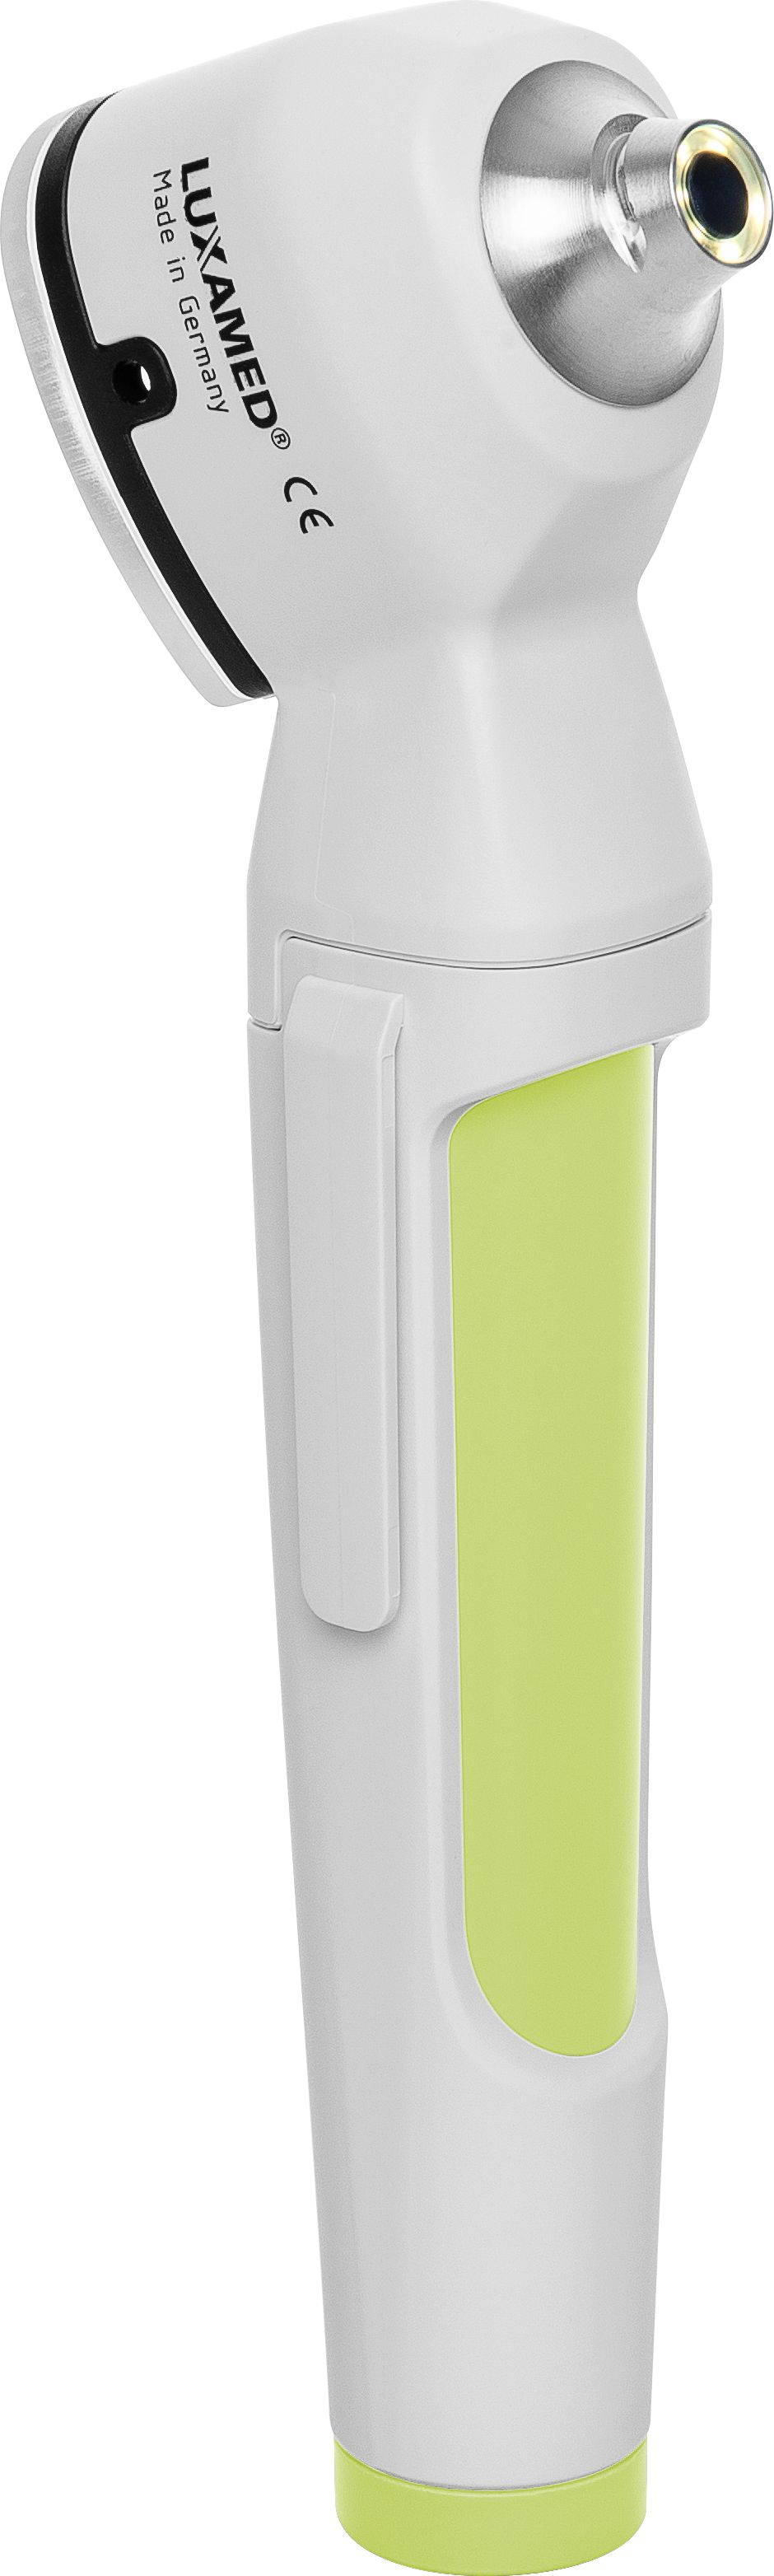 slide image LuxaScope Auris LED 2,5 V